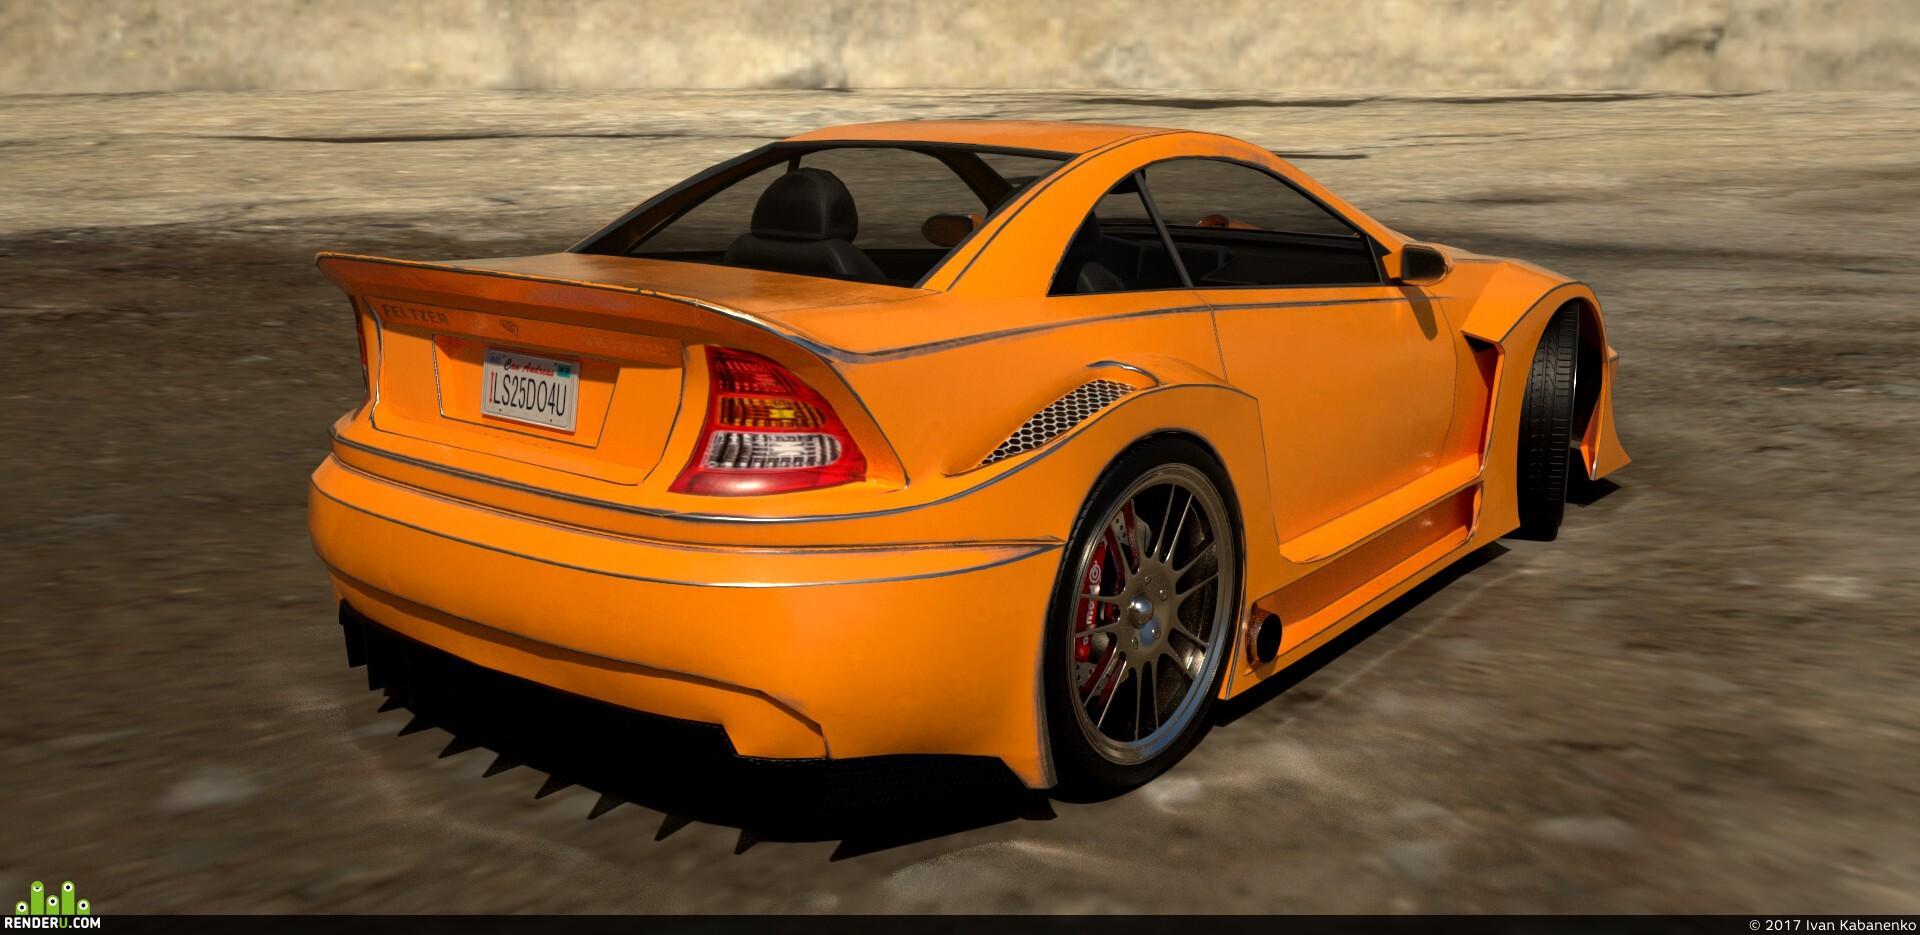 preview Benefactor Feltzer GTA V sportcar (25k tris)